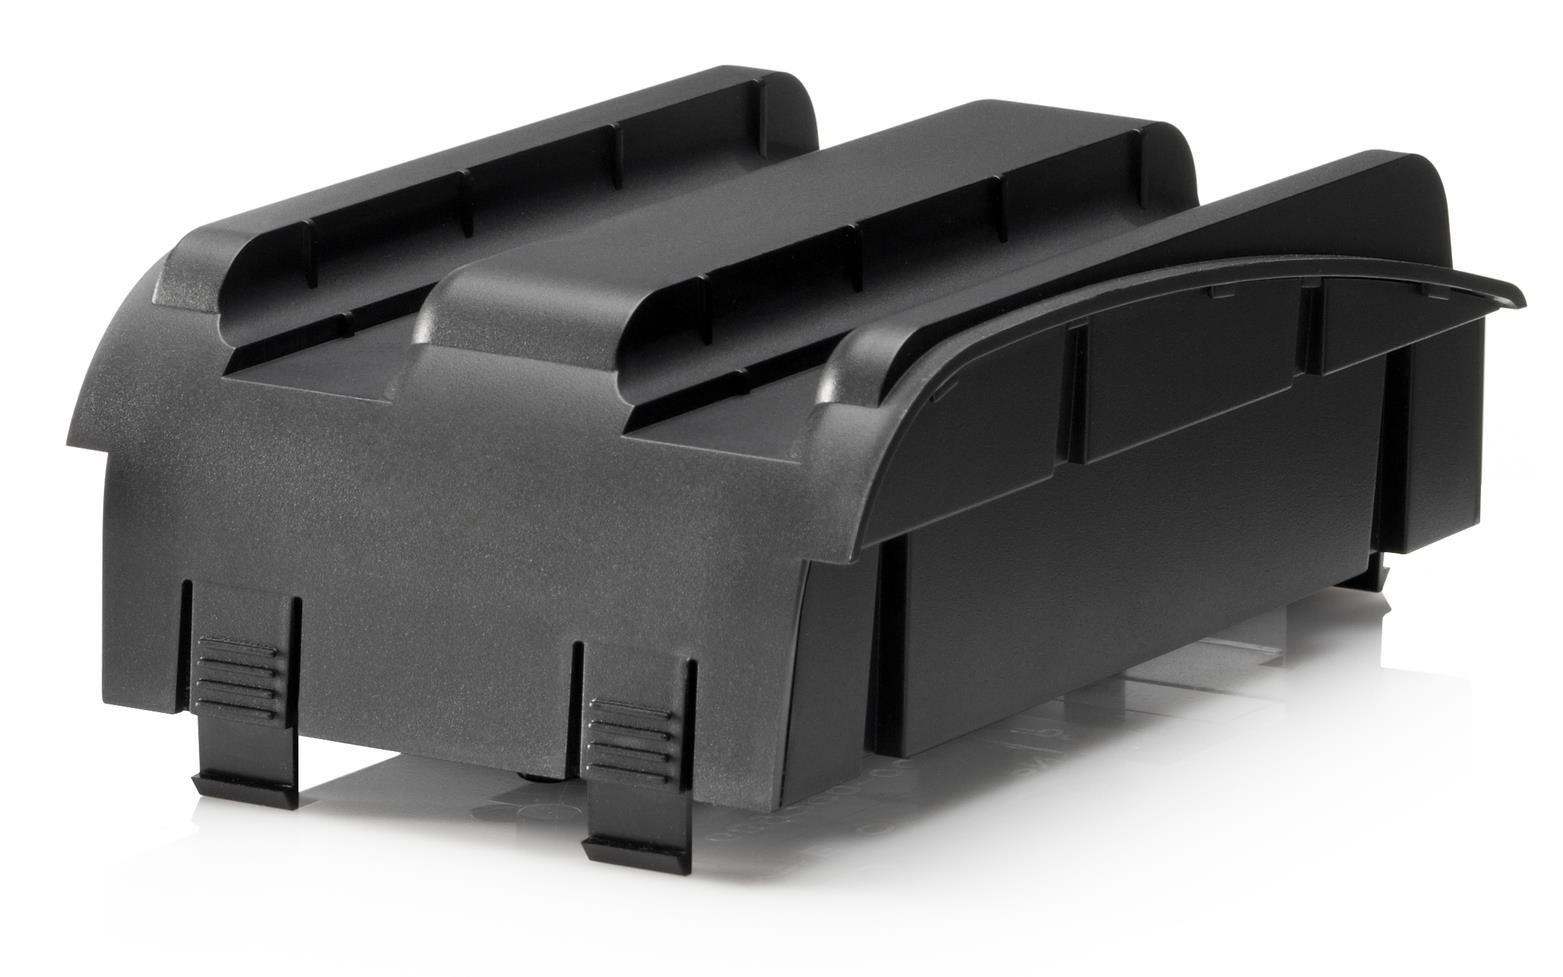 HP SX03-09 Battery Adaptor